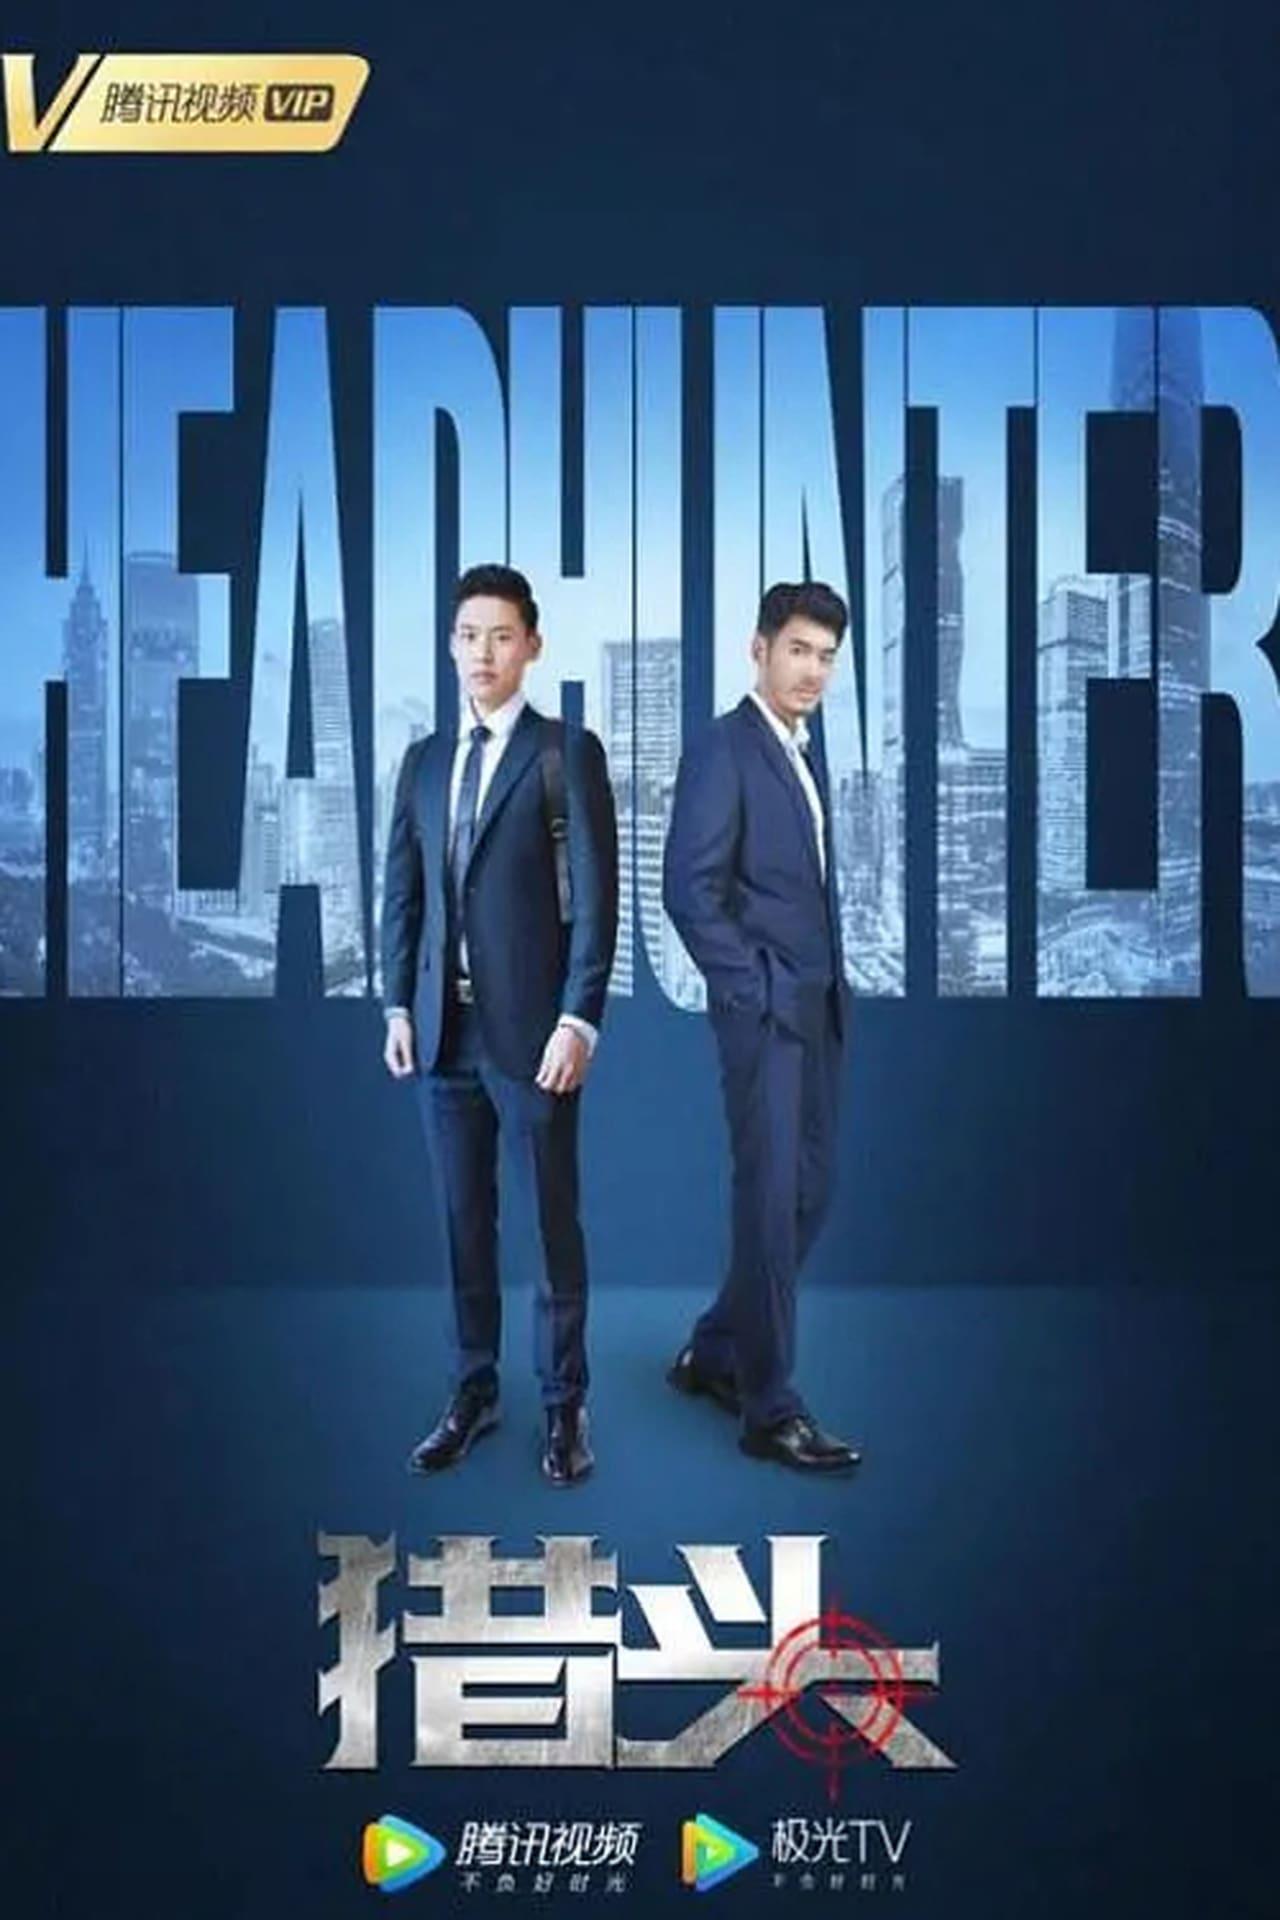 Headhunter (2020)